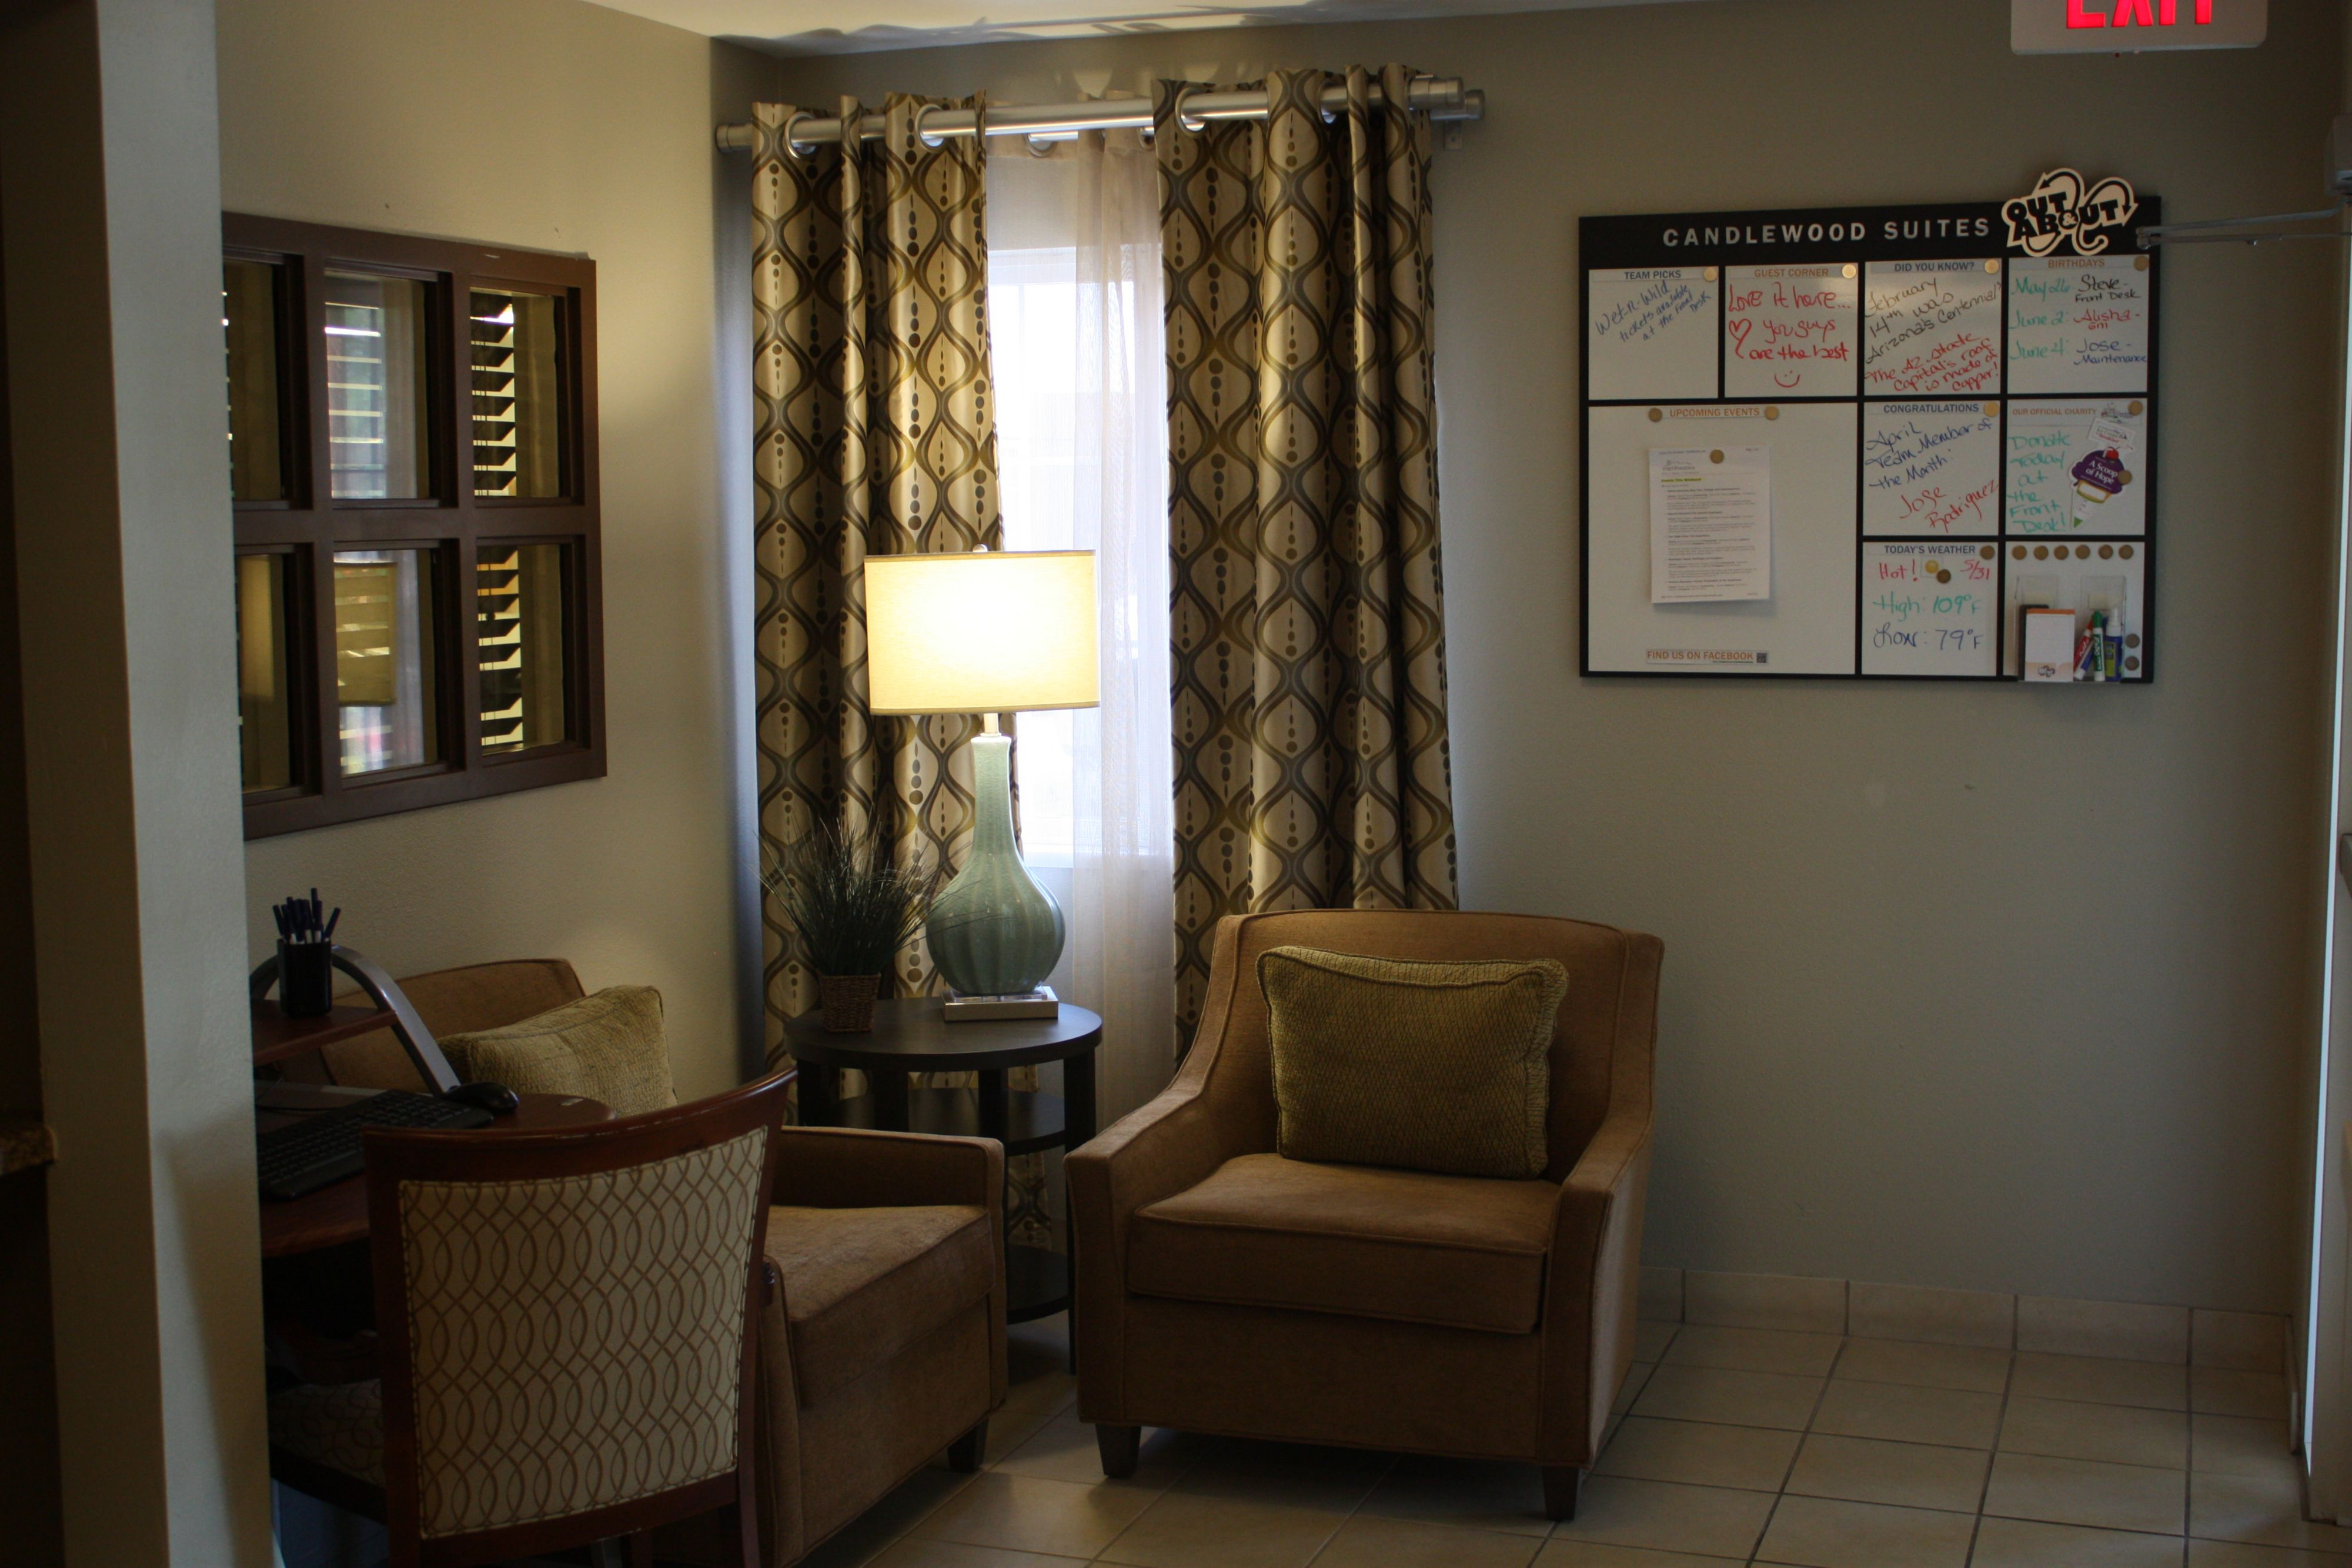 candlewood suites phoenix in phoenix az 85029. Black Bedroom Furniture Sets. Home Design Ideas